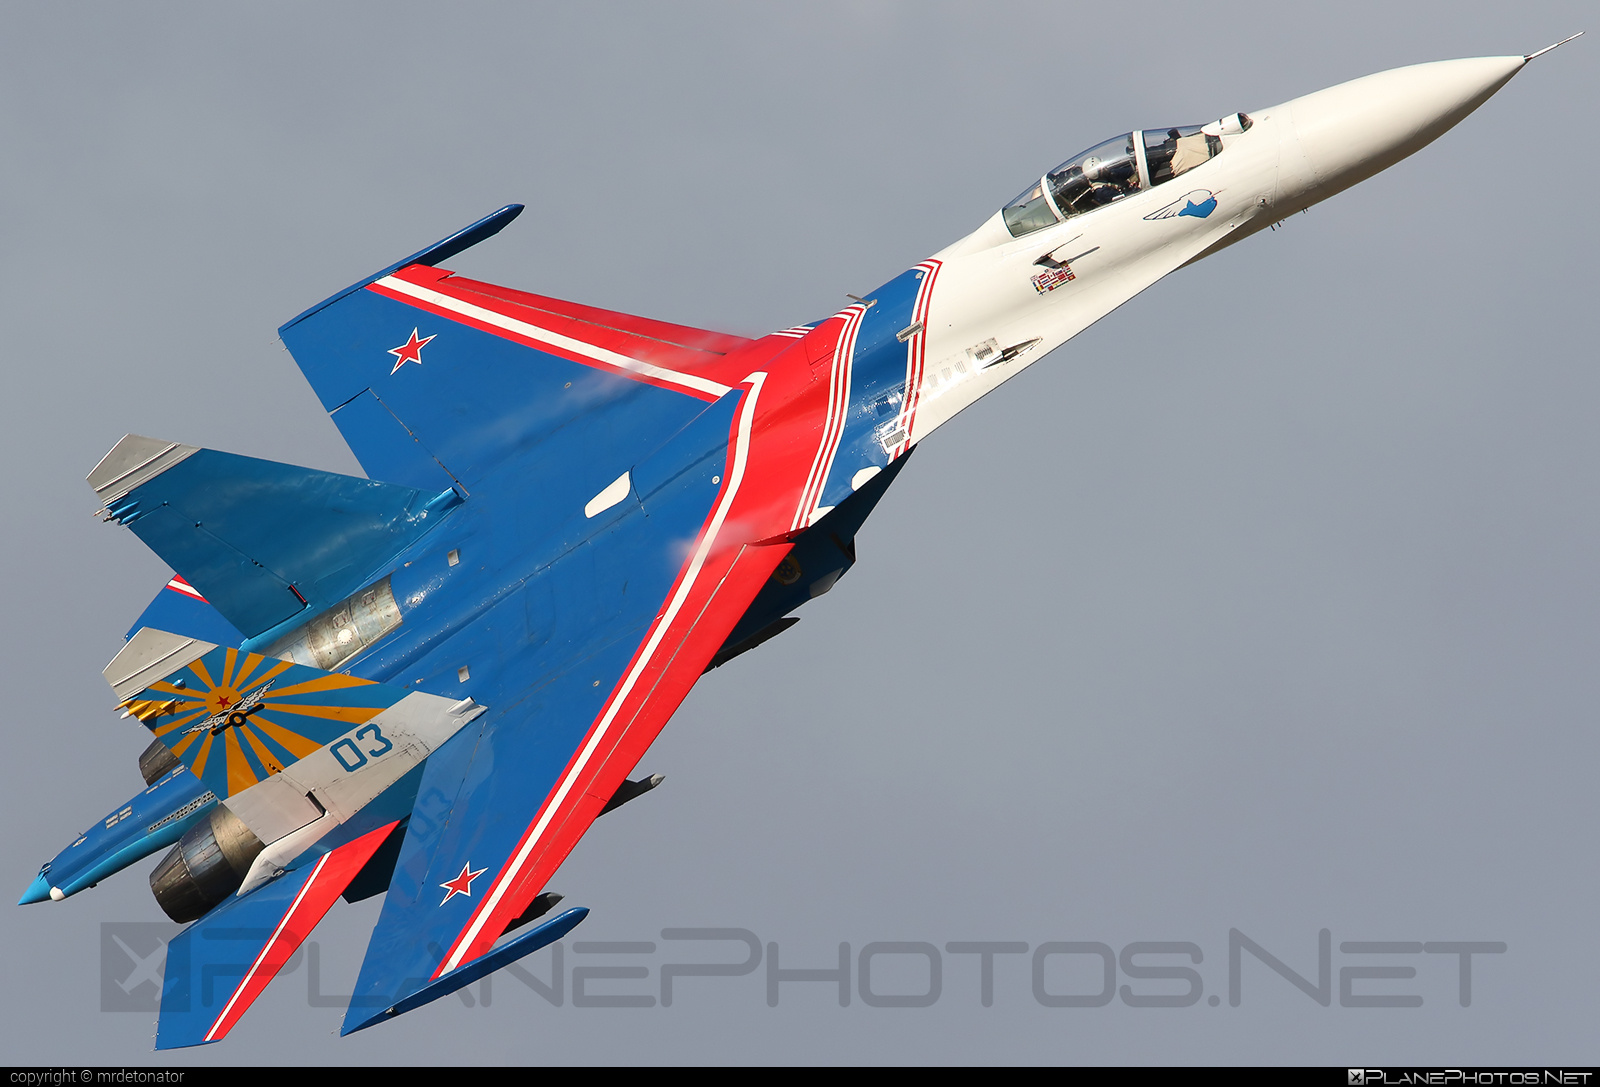 Sukhoi Su-27P - 03 operated by Voyenno-vozdushnye sily Rossii (Russian Air Force) #su27 #su27p #sukhoi #sukhoi27